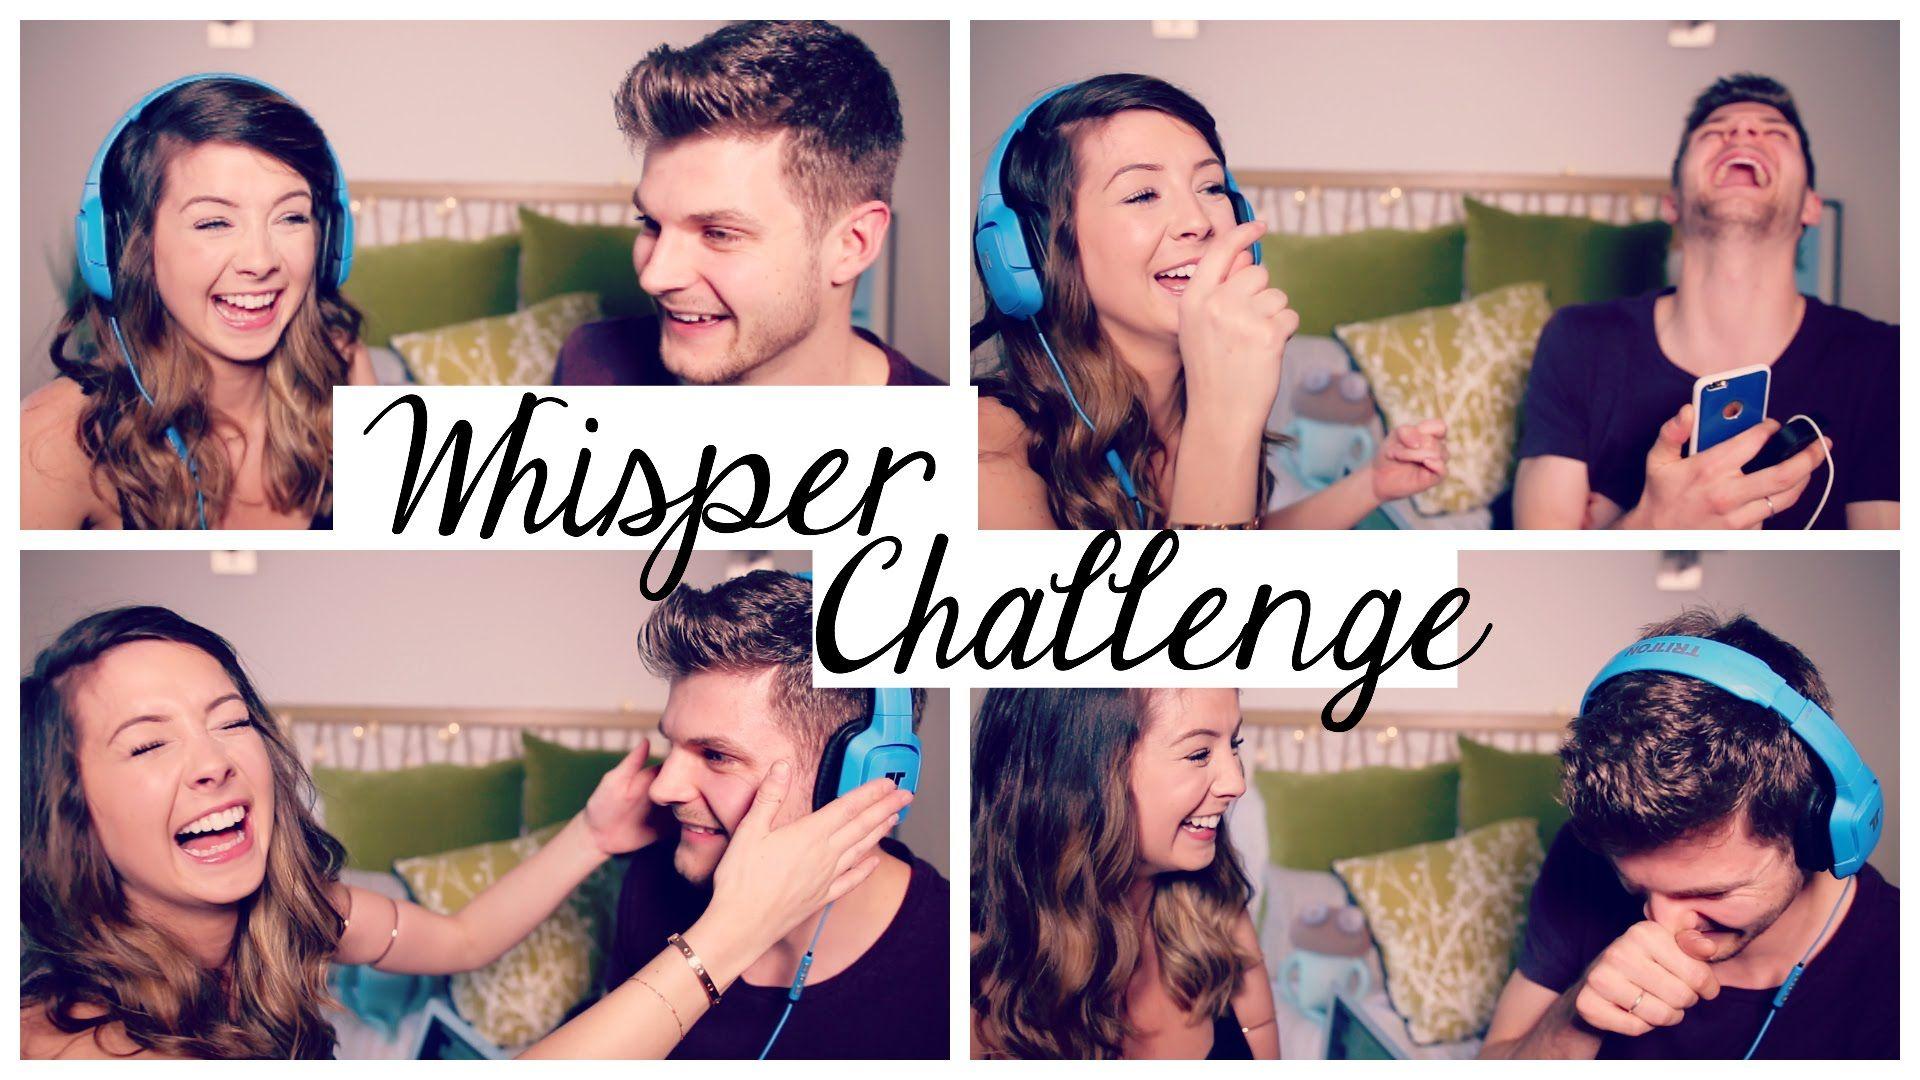 Download Whisper Challenge Google Play softwares ...  |Whisper Challenge Ideas